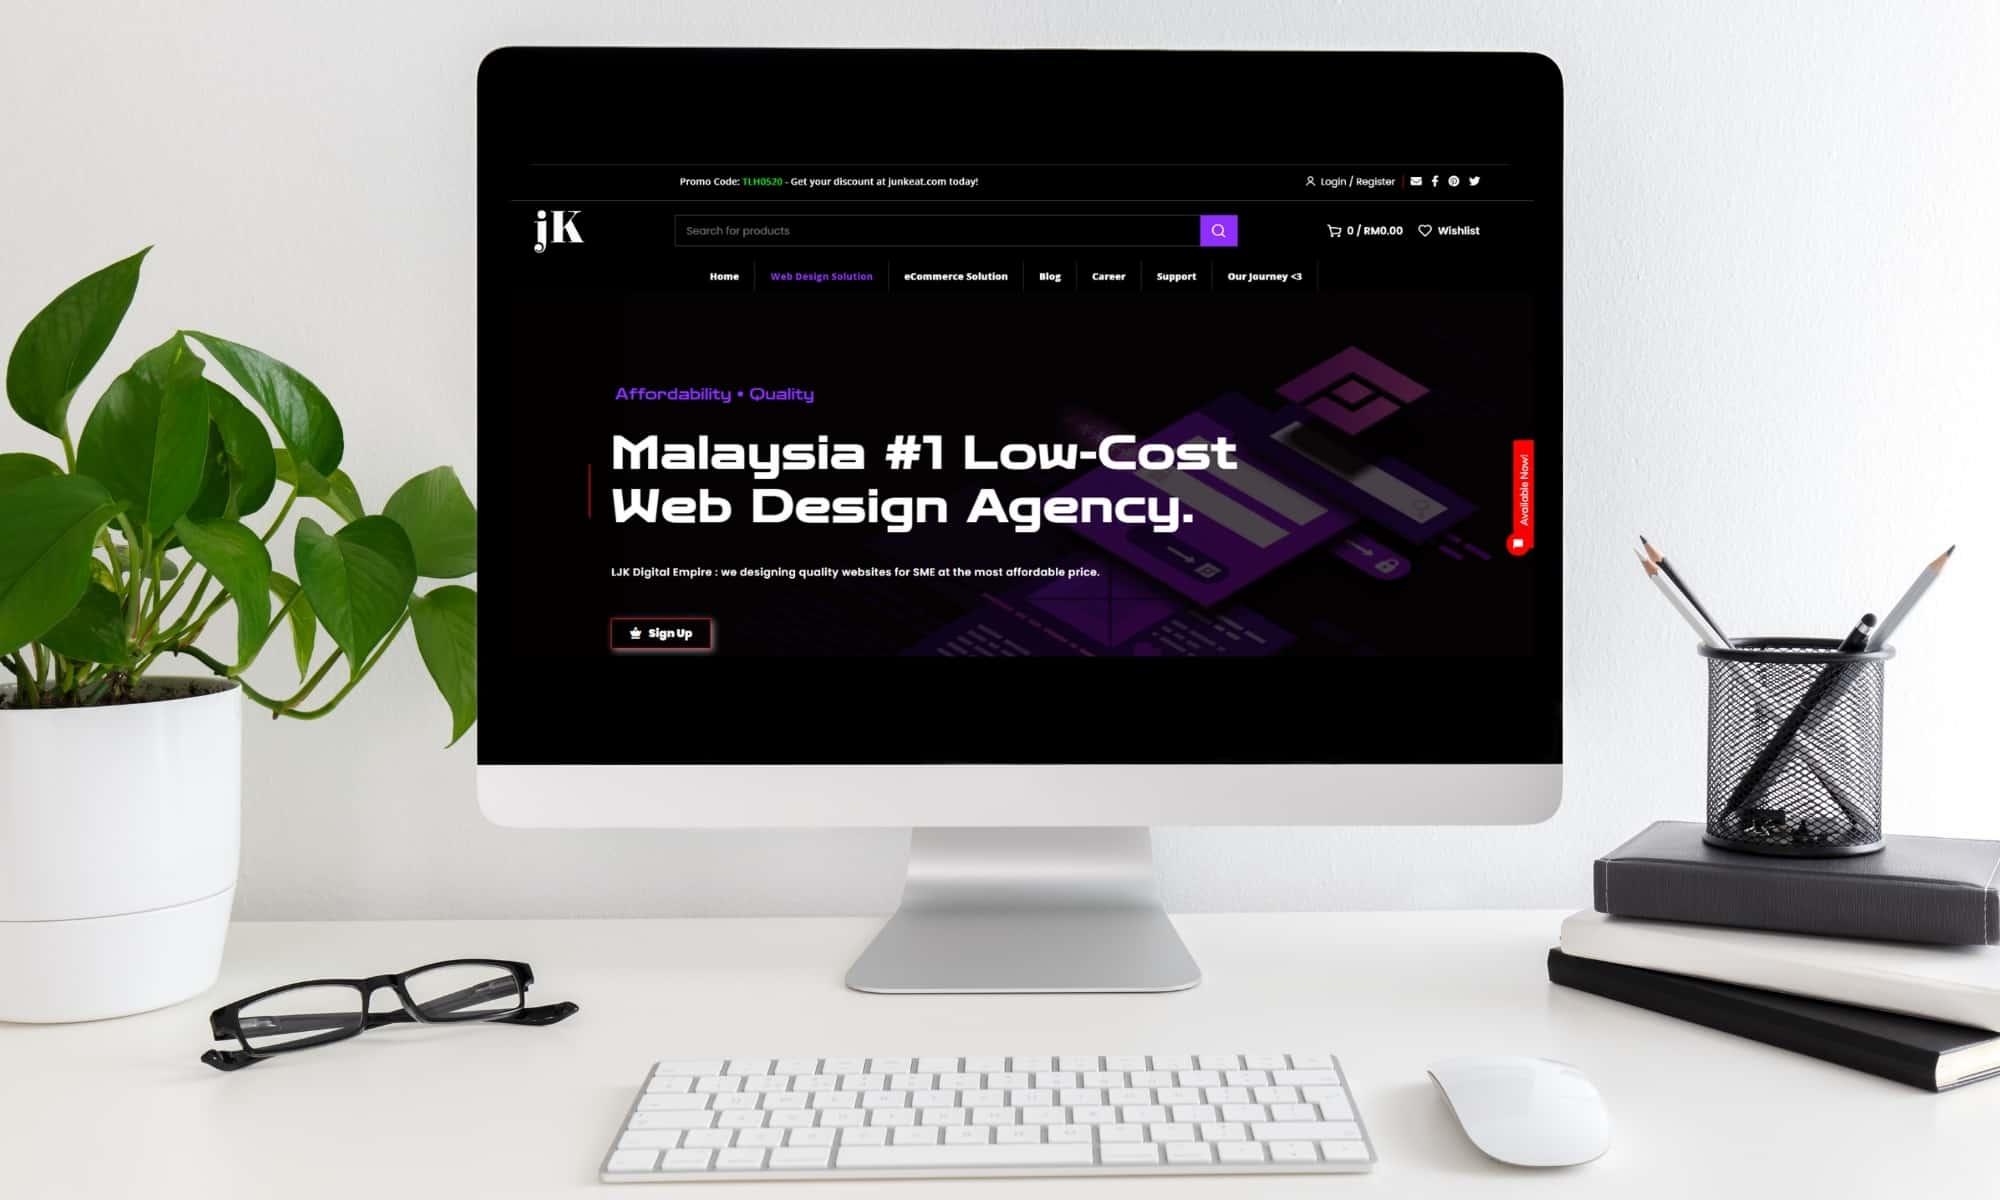 LJK Digital Empire - Low-Cost Web Design Agency Cheras - SEO 1